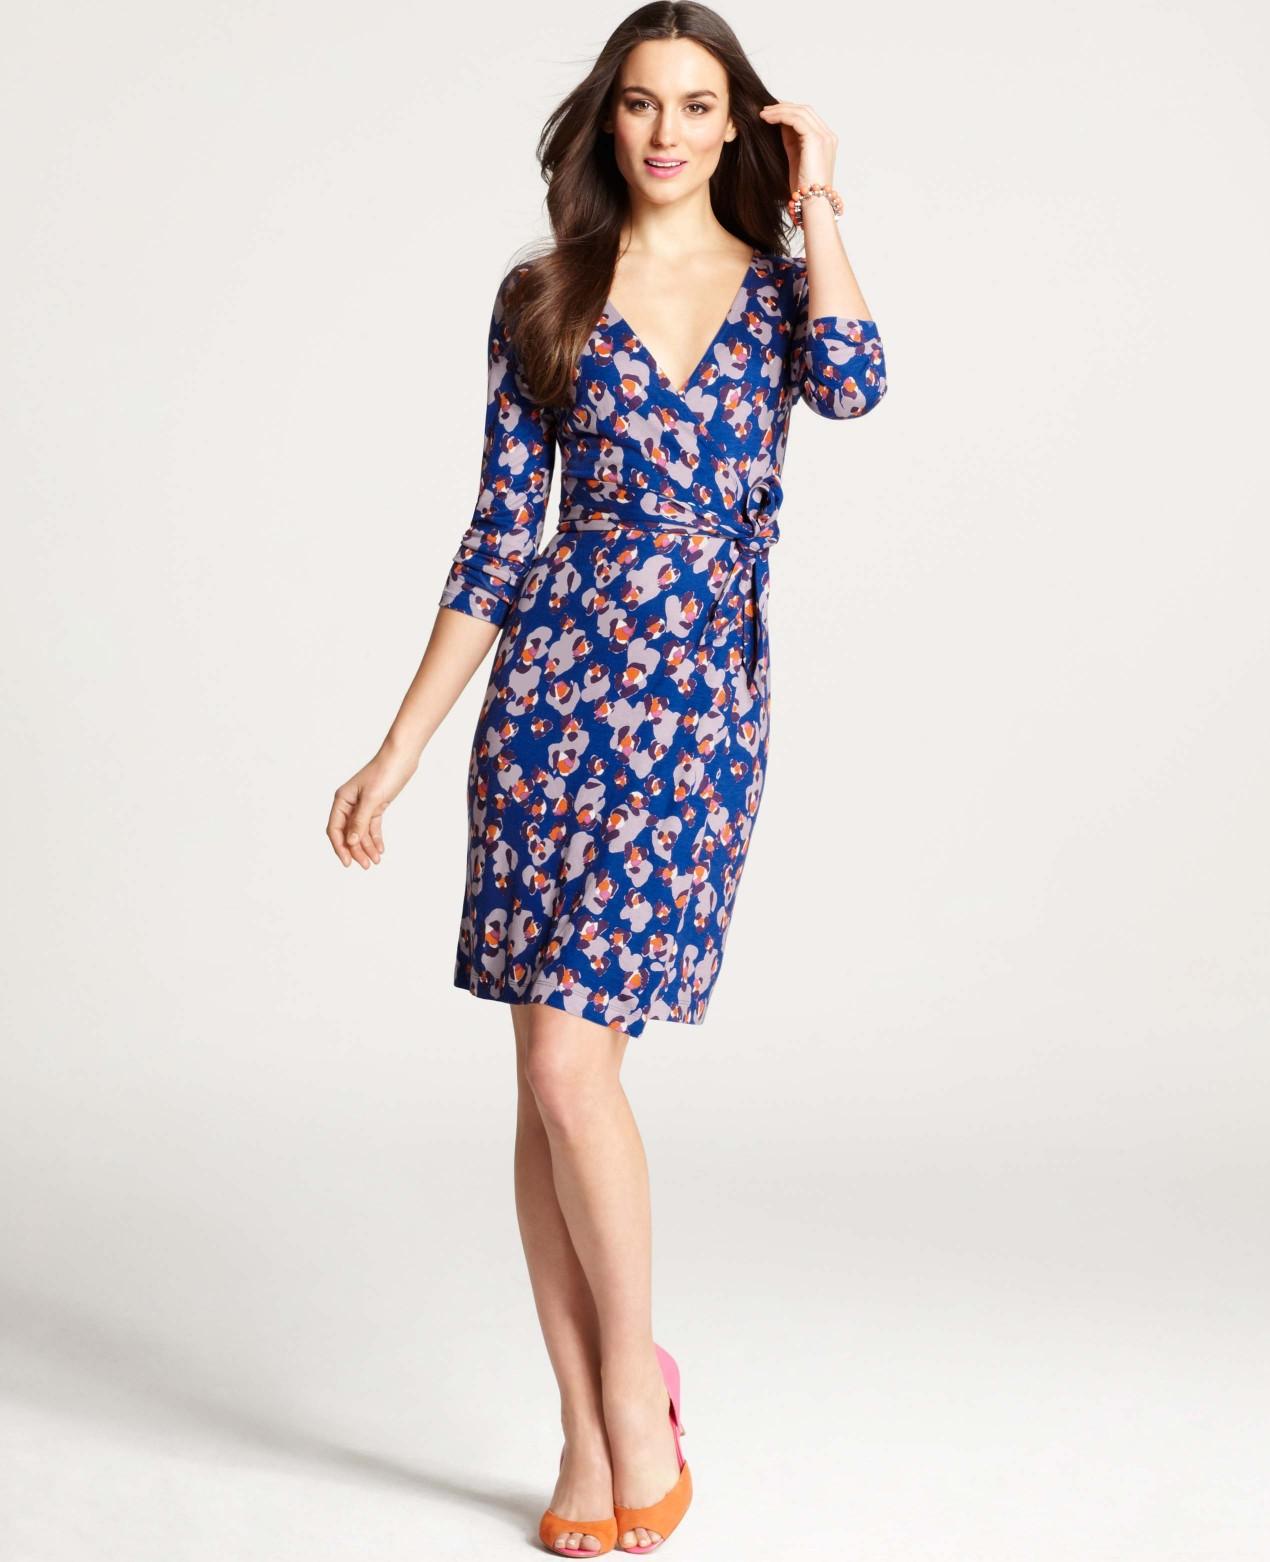 Ann taylor color splash wrap dress